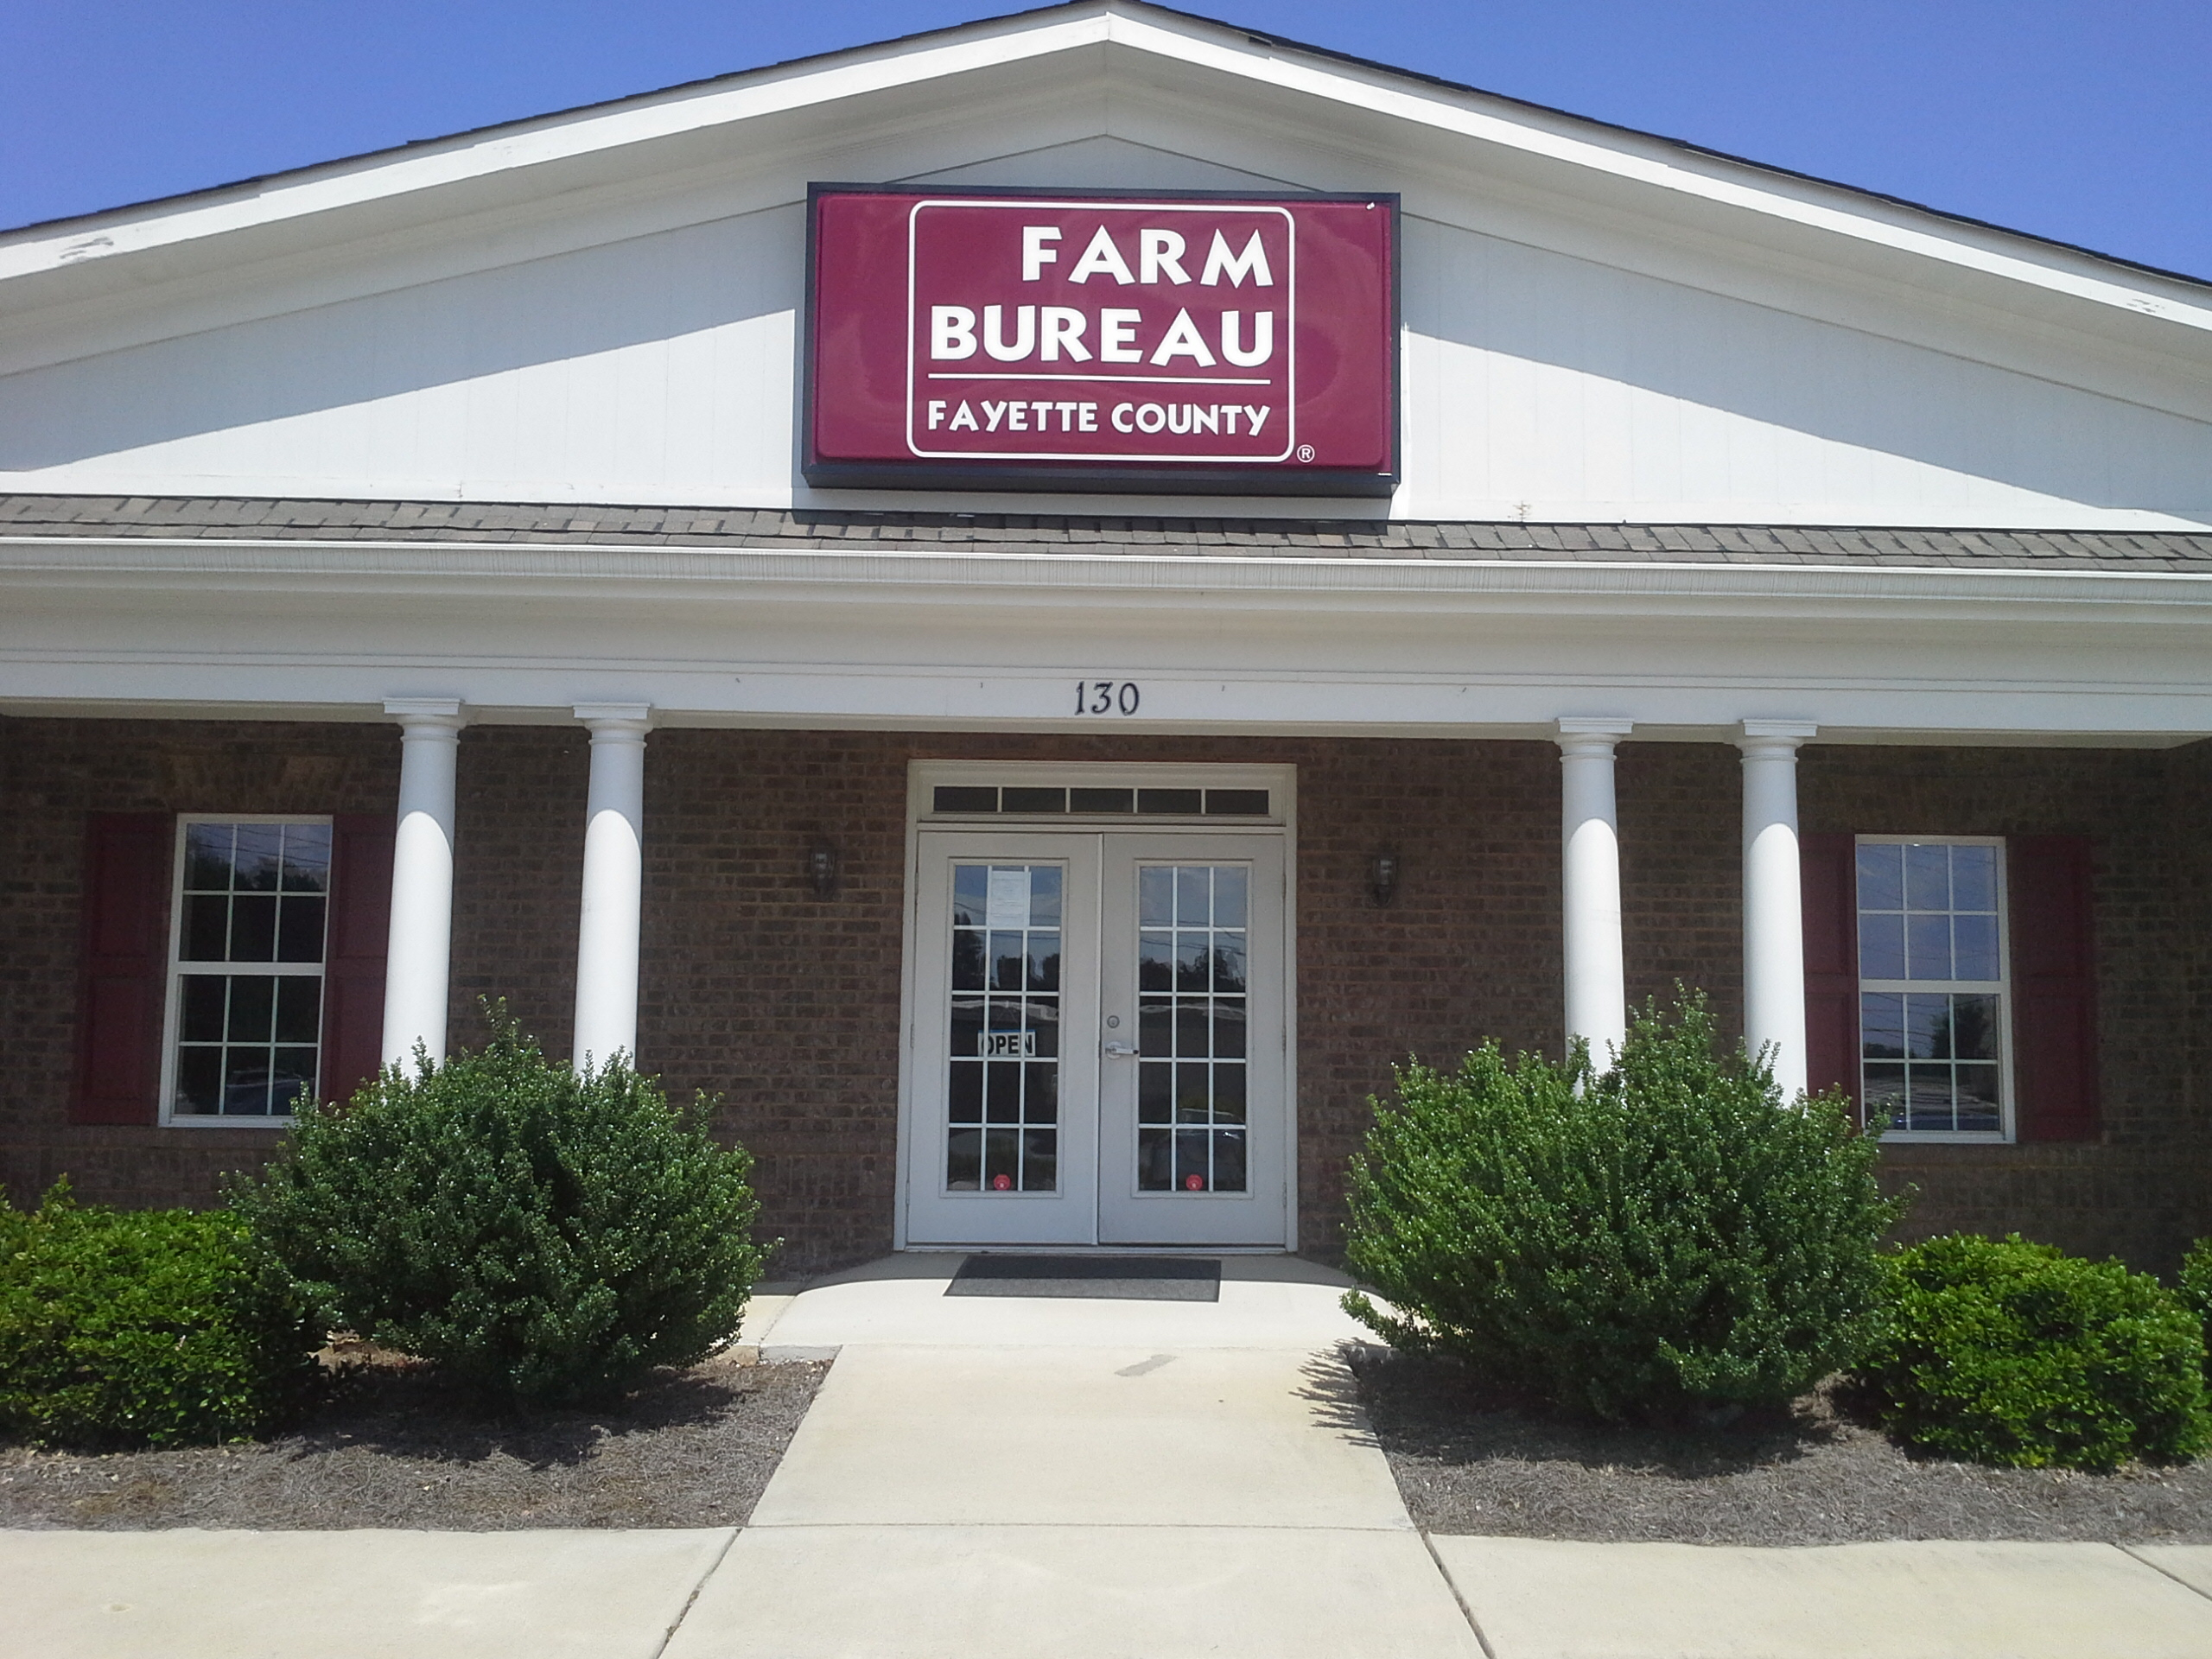 farm bureau insurance in fayetteville ga whitepages. Black Bedroom Furniture Sets. Home Design Ideas